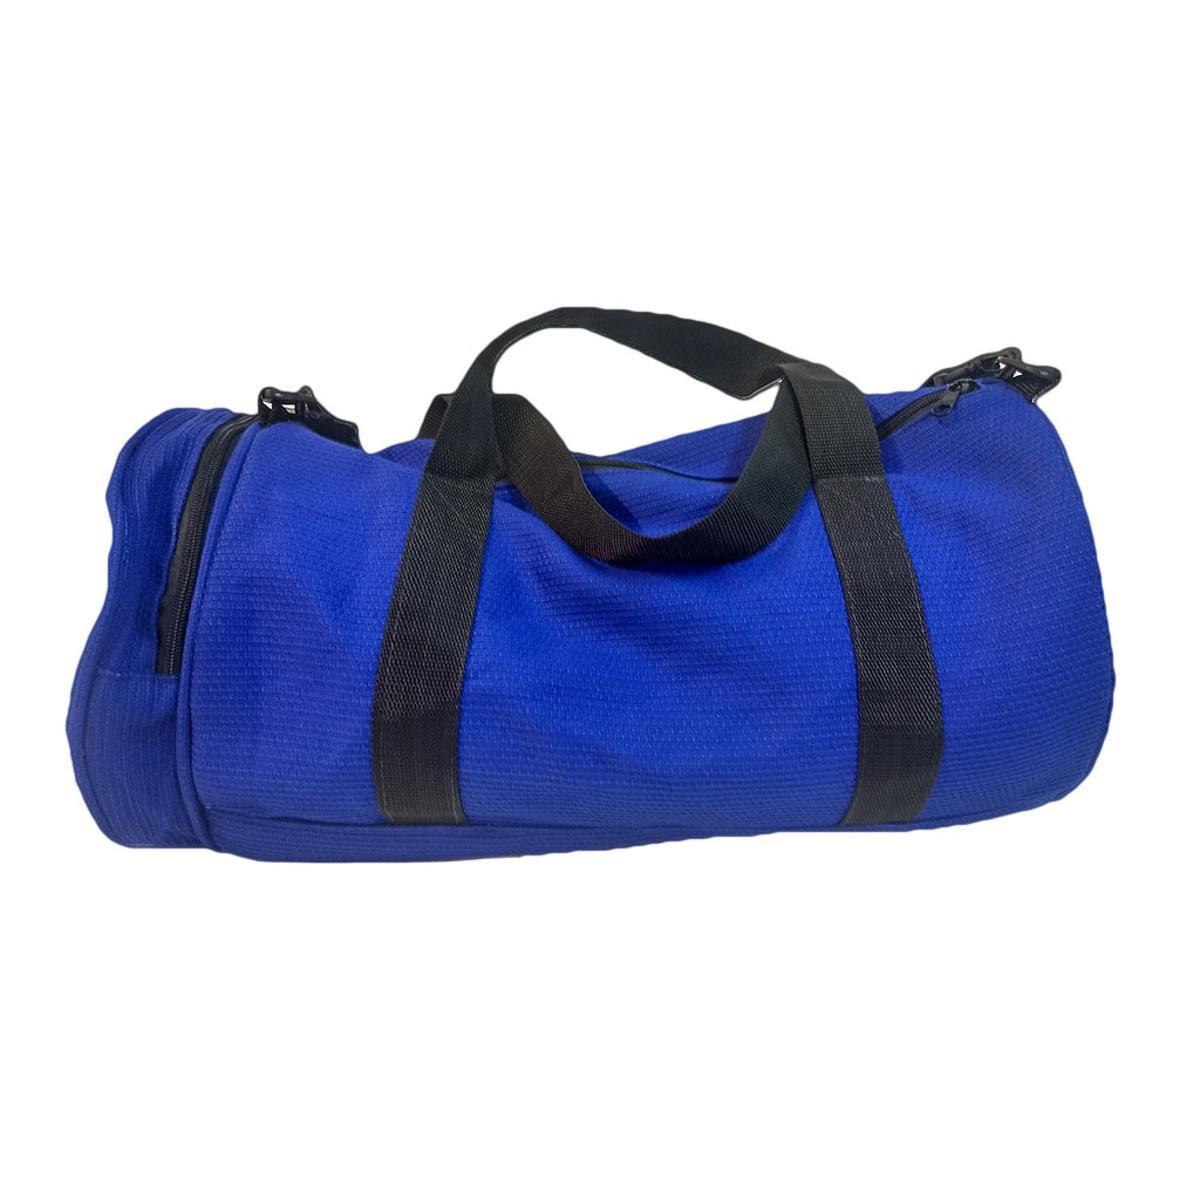 Bolsa Azul Combat Bolsa para Lateral Kimono Brazil Lateral Hxq05nIPw